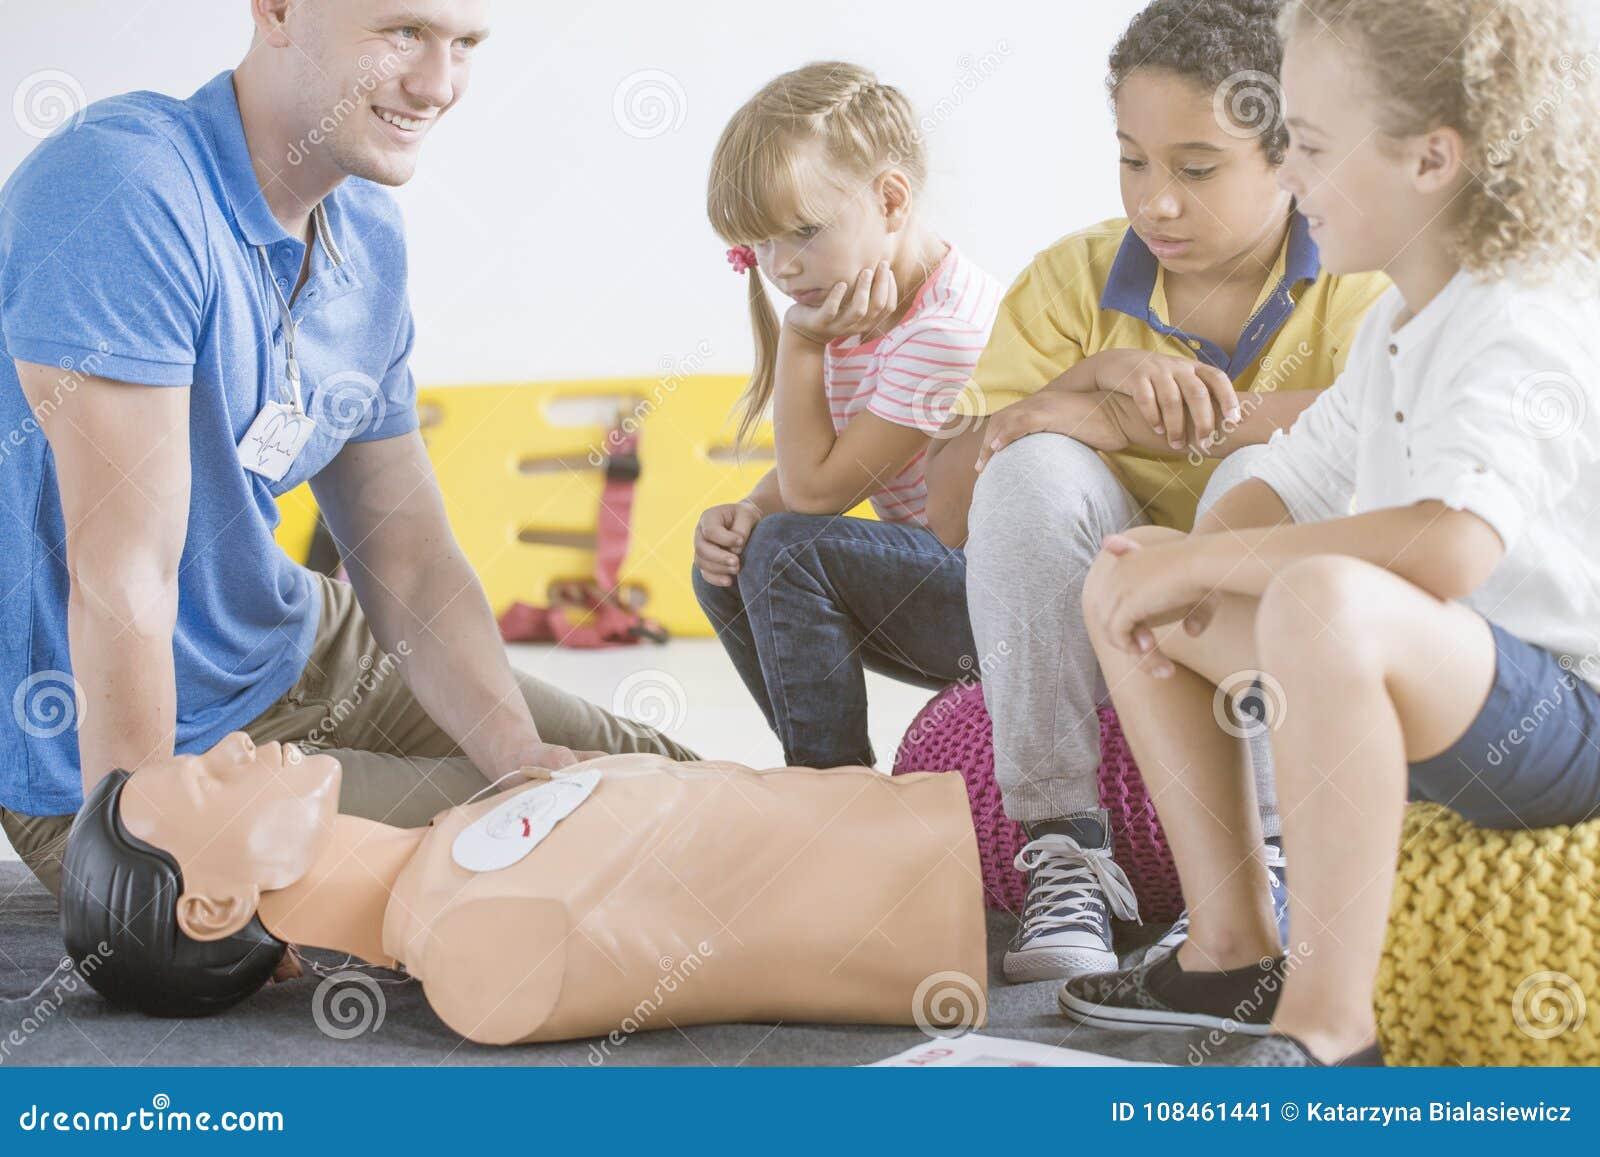 Paramedic showing defibrillator on manikin